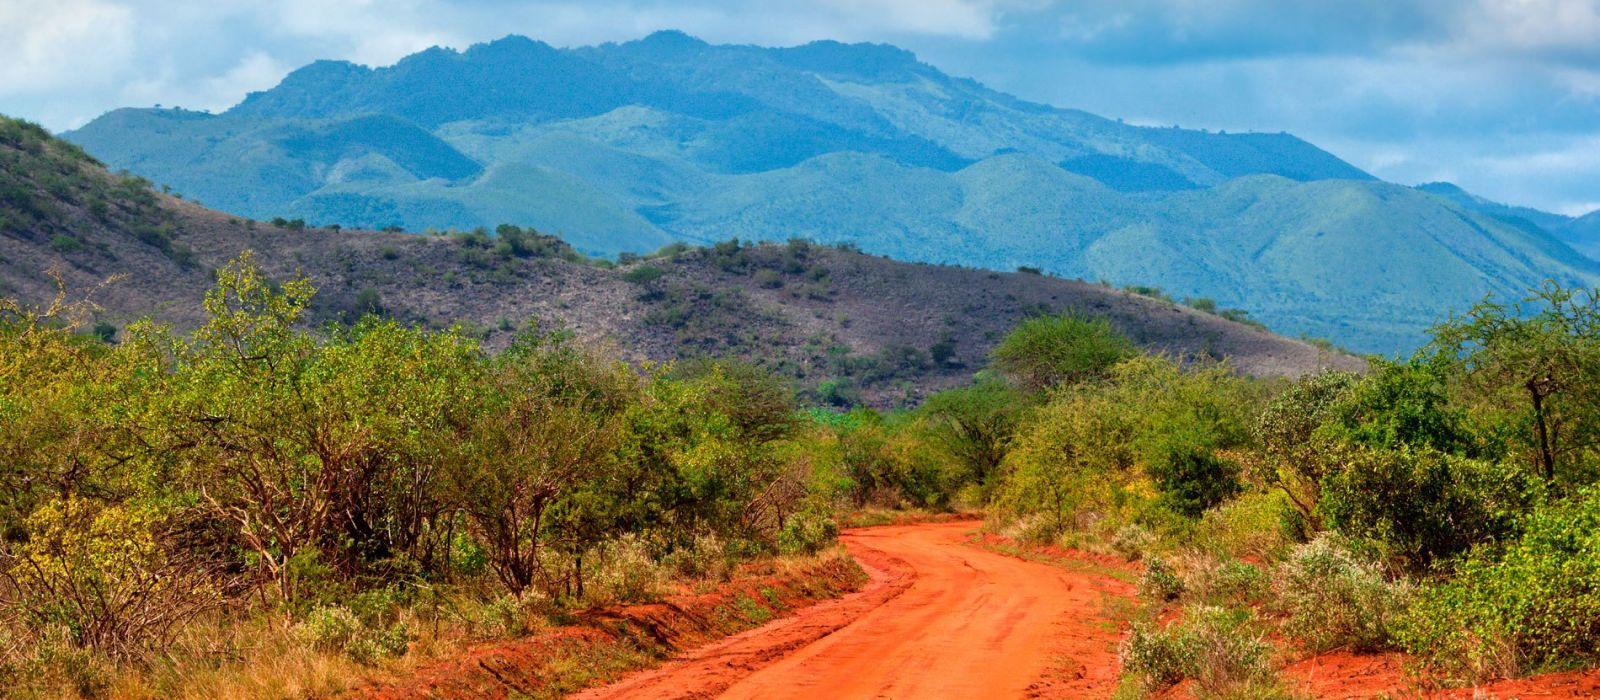 Destination Tsavo West Kenya